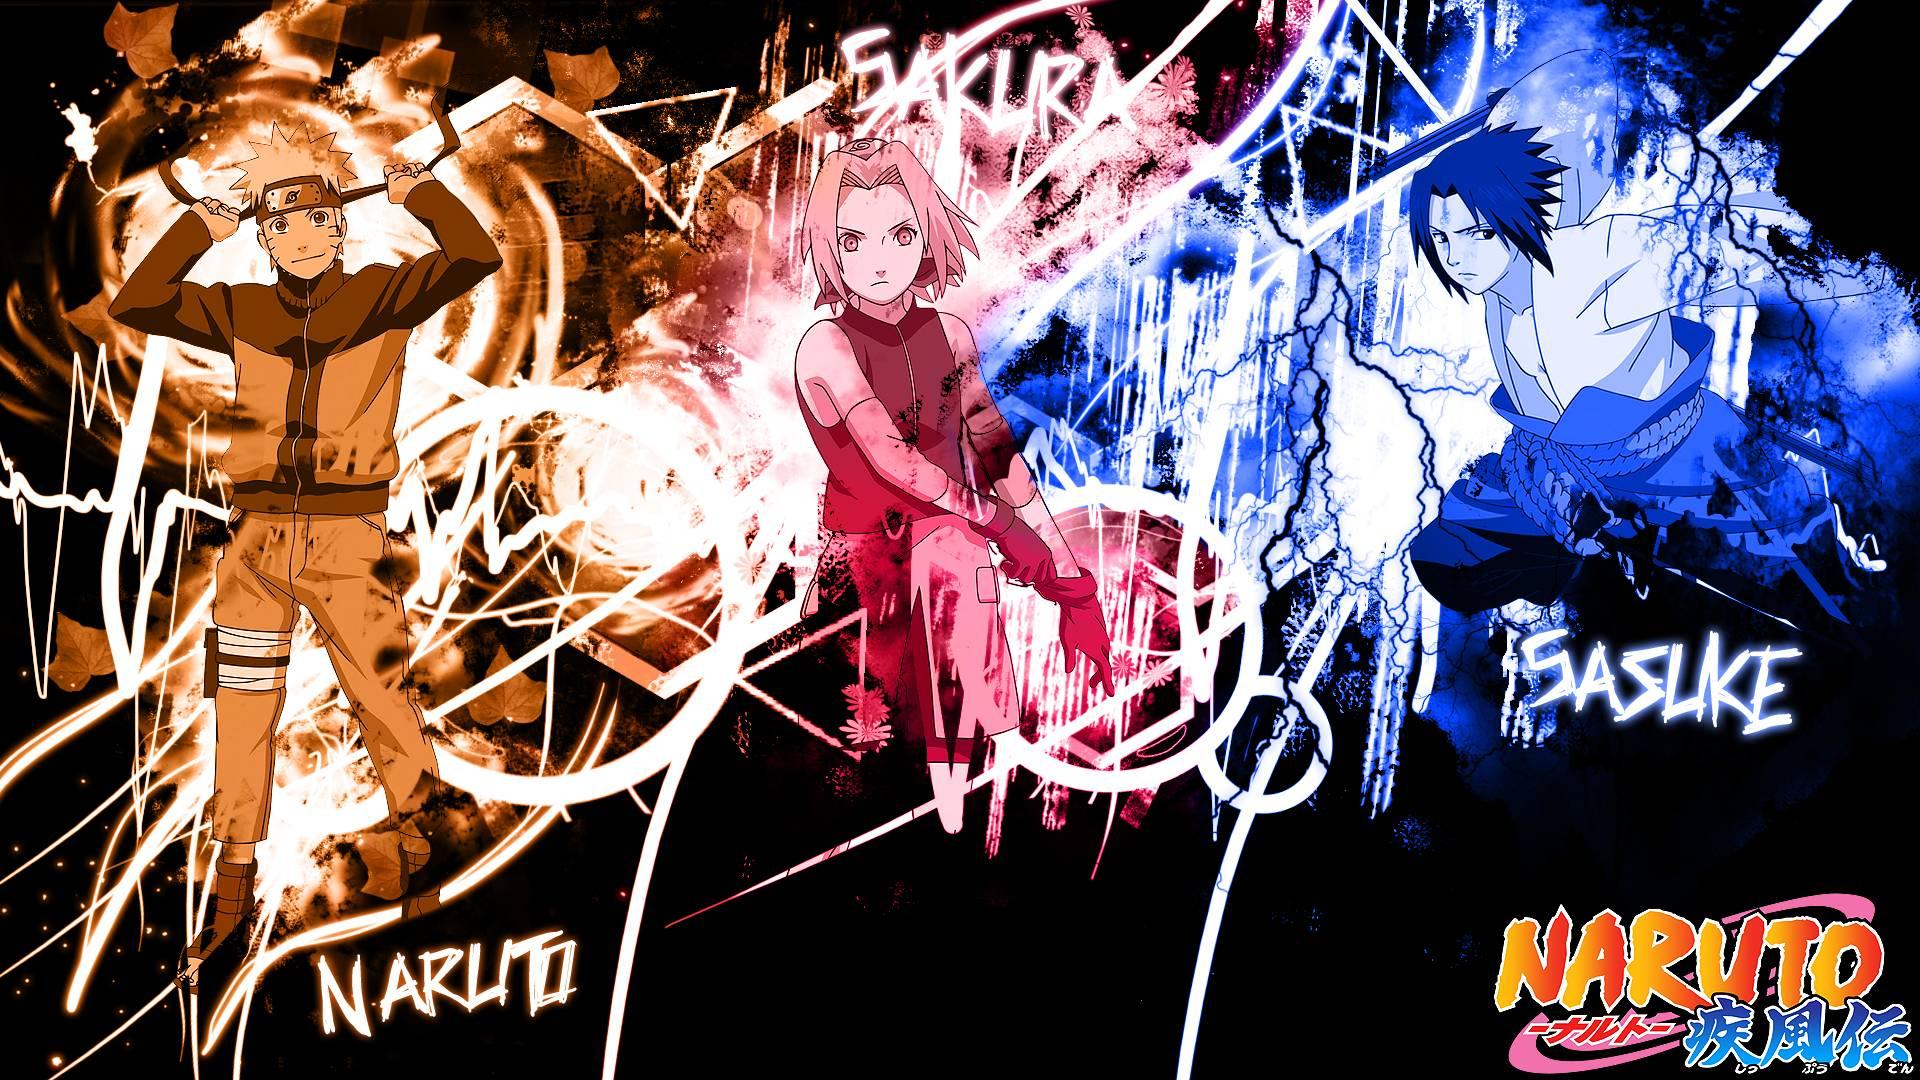 Simple Wallpaper Halloween Naruto - Wallpapers-HD-Naruto-Shippuden-011  Picture_453150.jpg